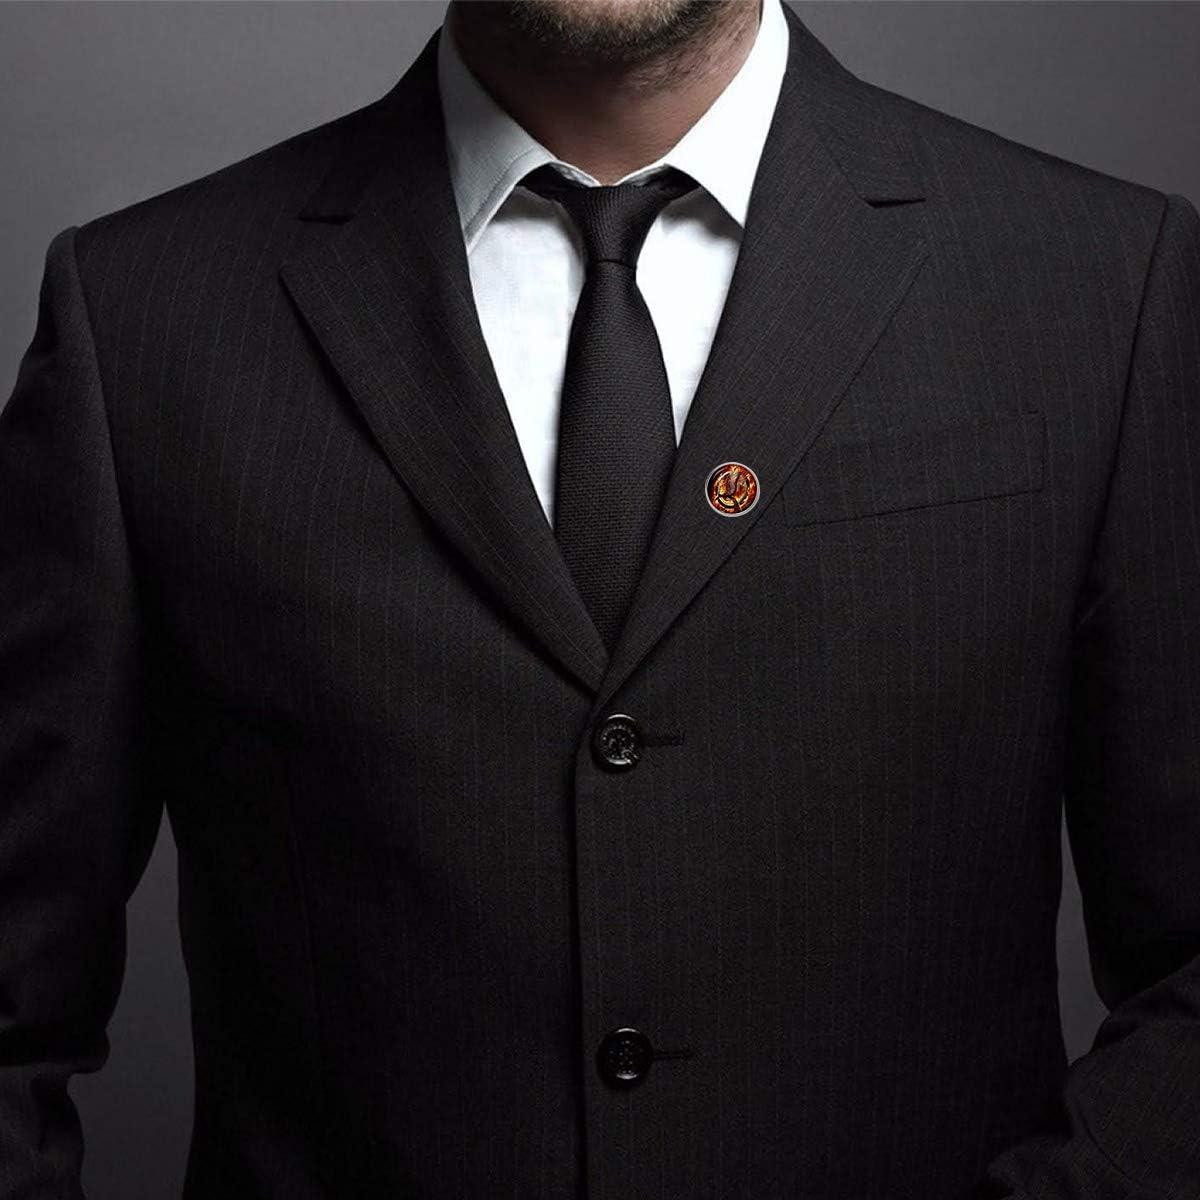 Custom Lapel Pin Brooches Vintage Moltres Banquet Badge Pins Trendy Accessory Jacket T-Shirt Bag Hat Shoe